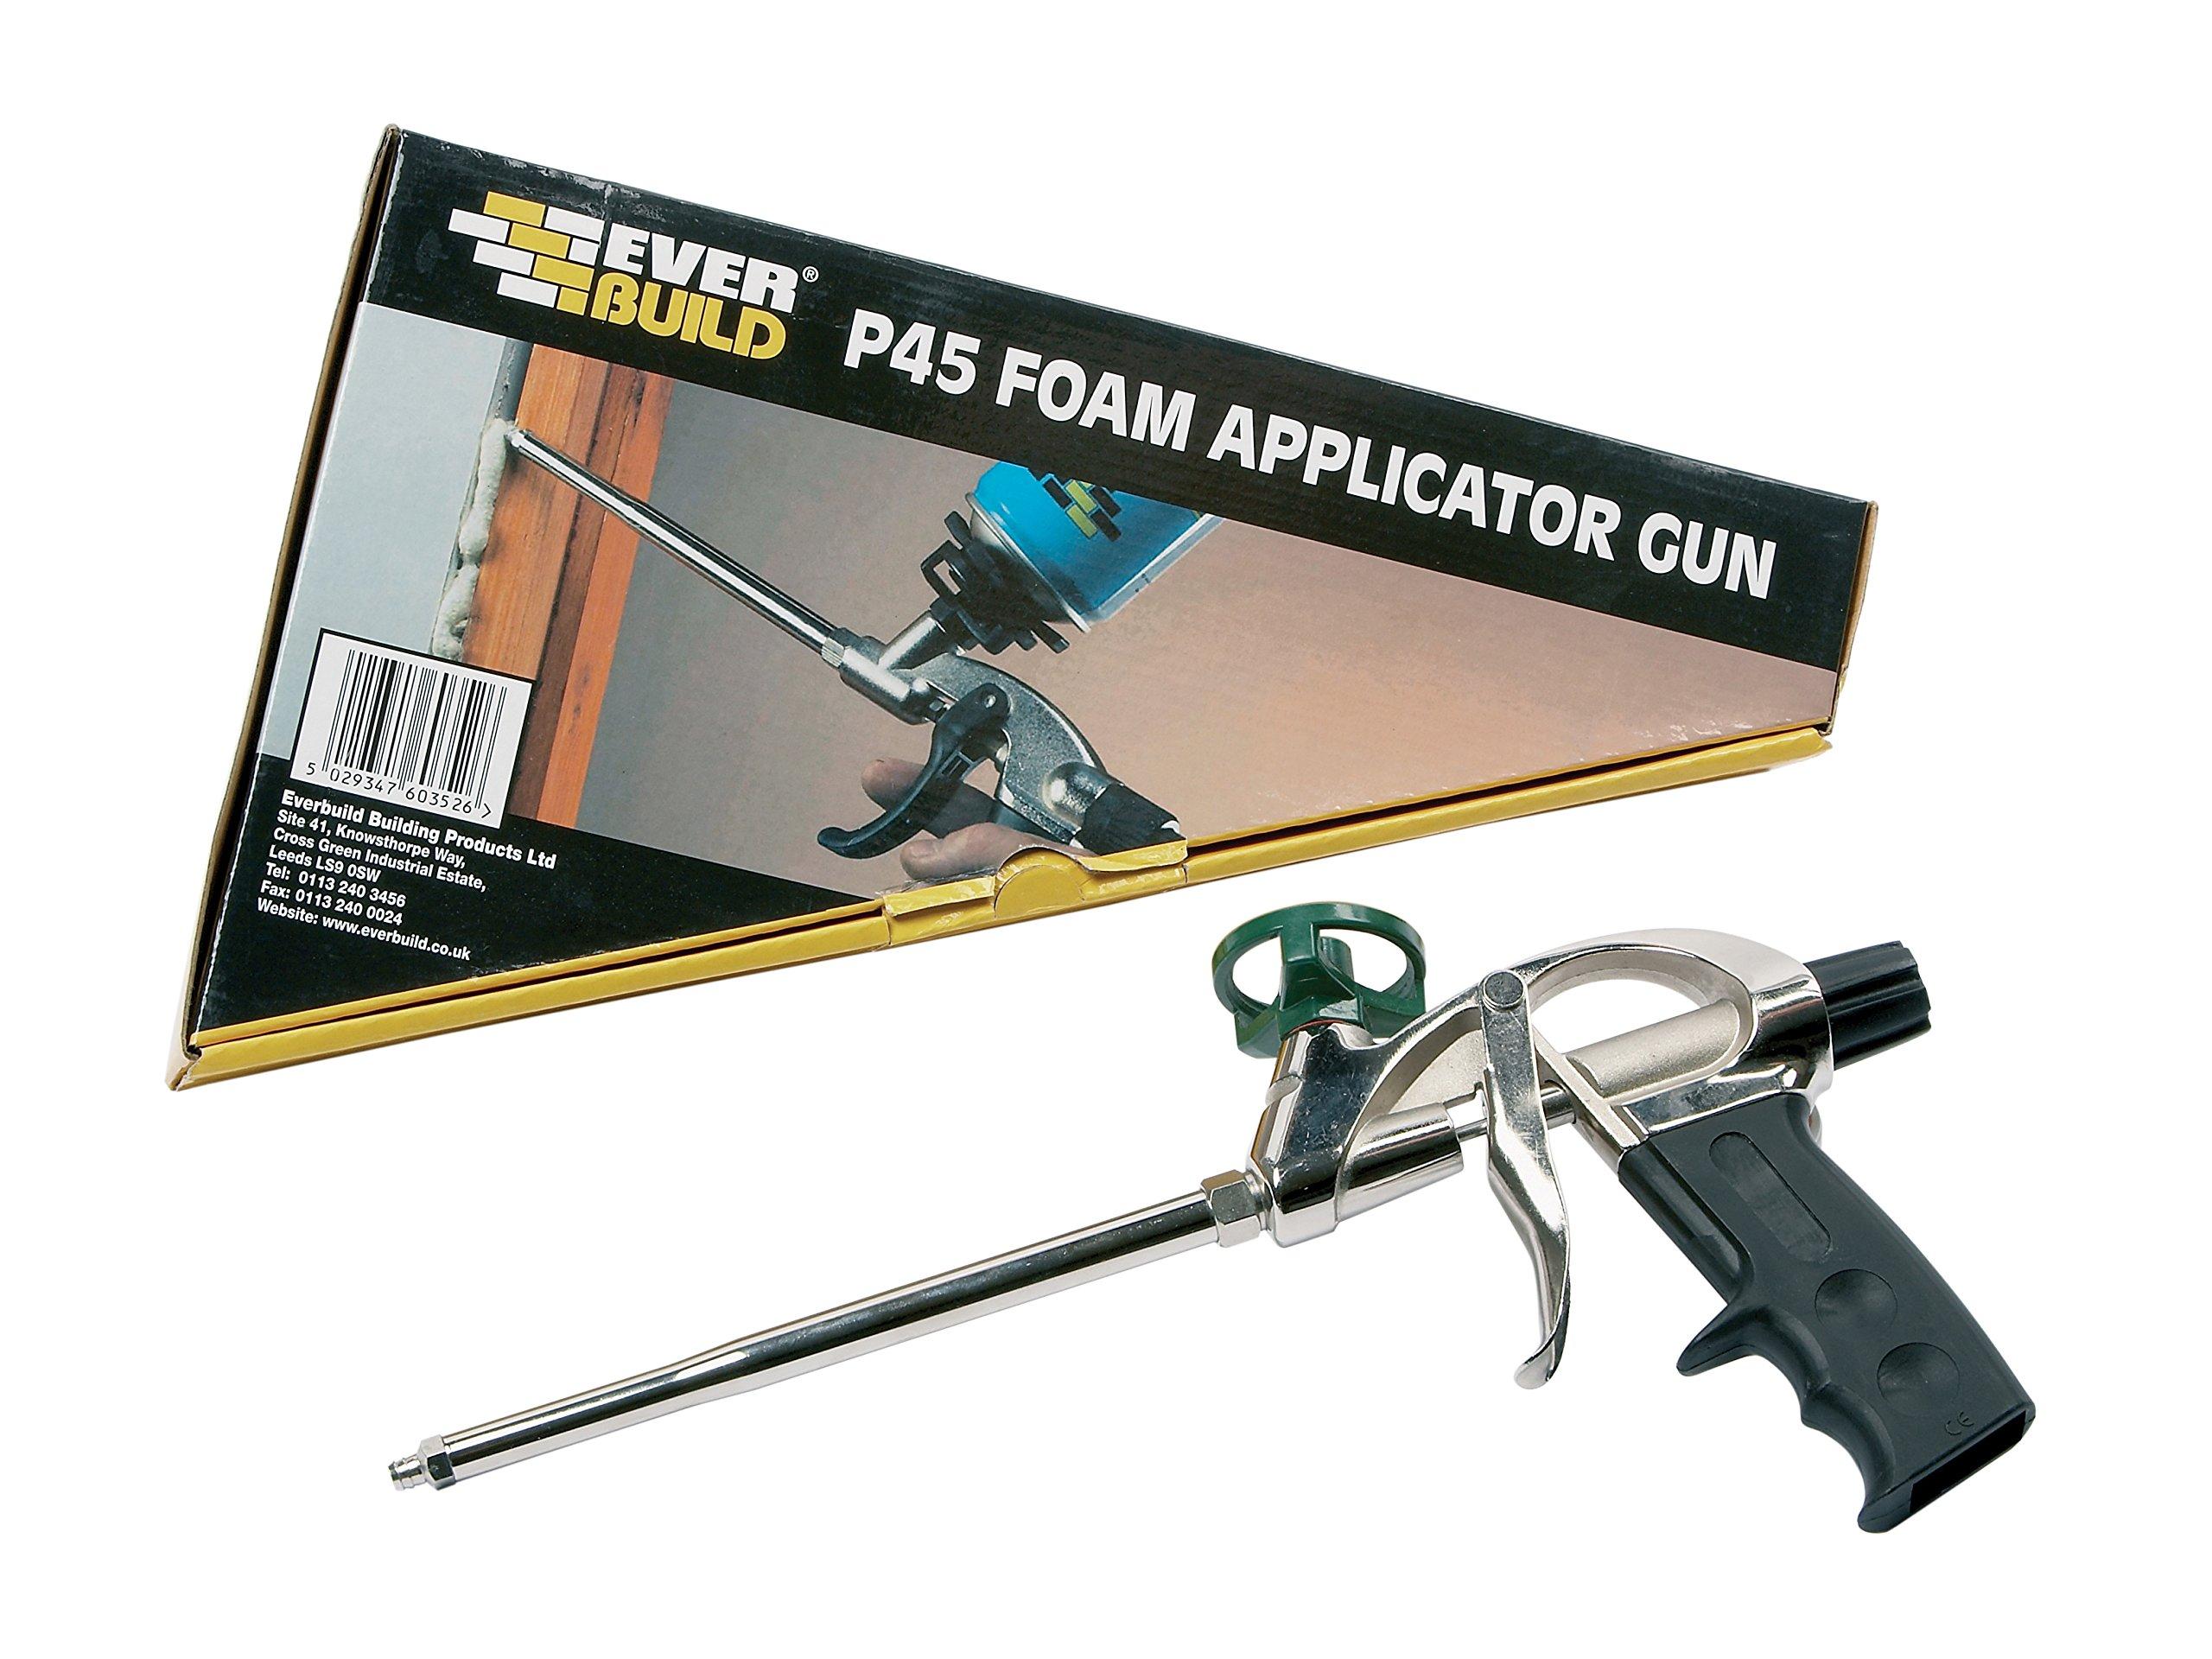 P45 Medium Duty Metal Foam Applicator by EveRBUILD